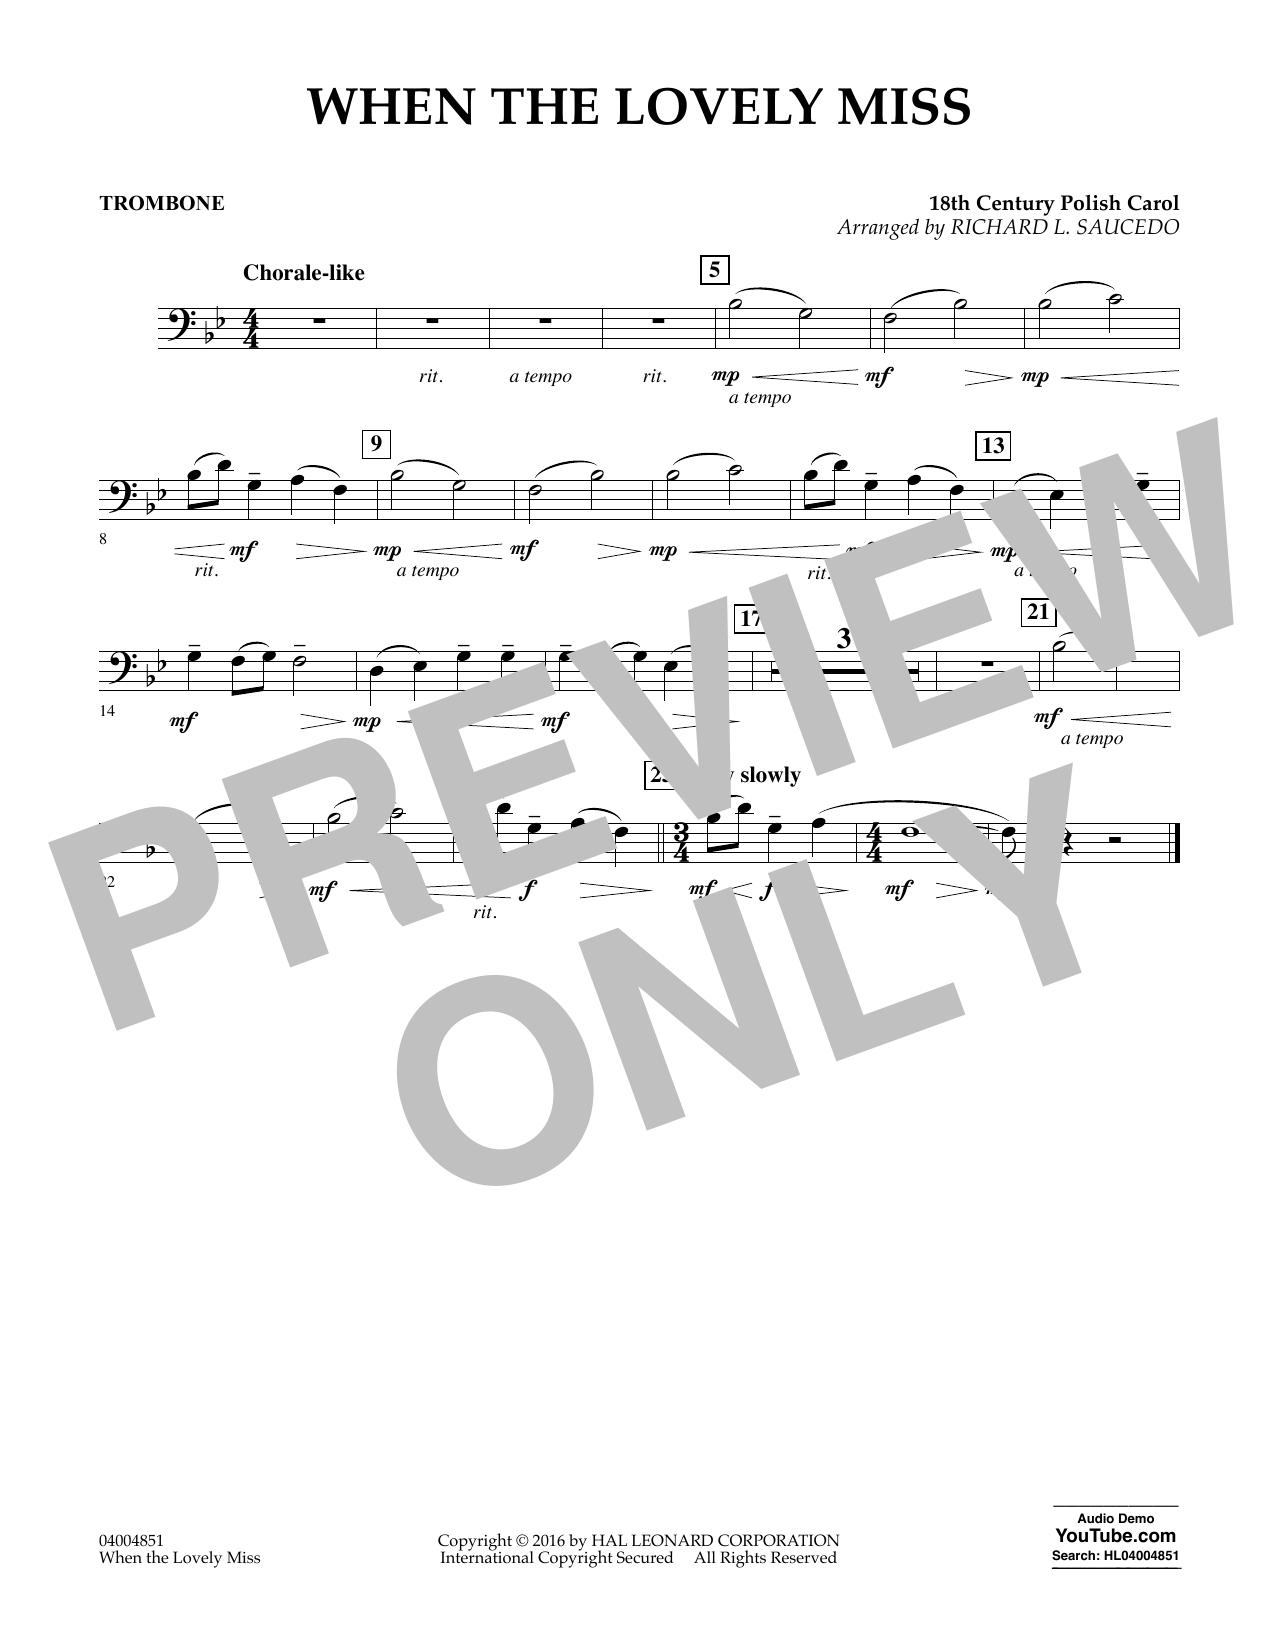 When the Lovely Miss (18th Century Polish Carol) - Trombone (Concert Band)